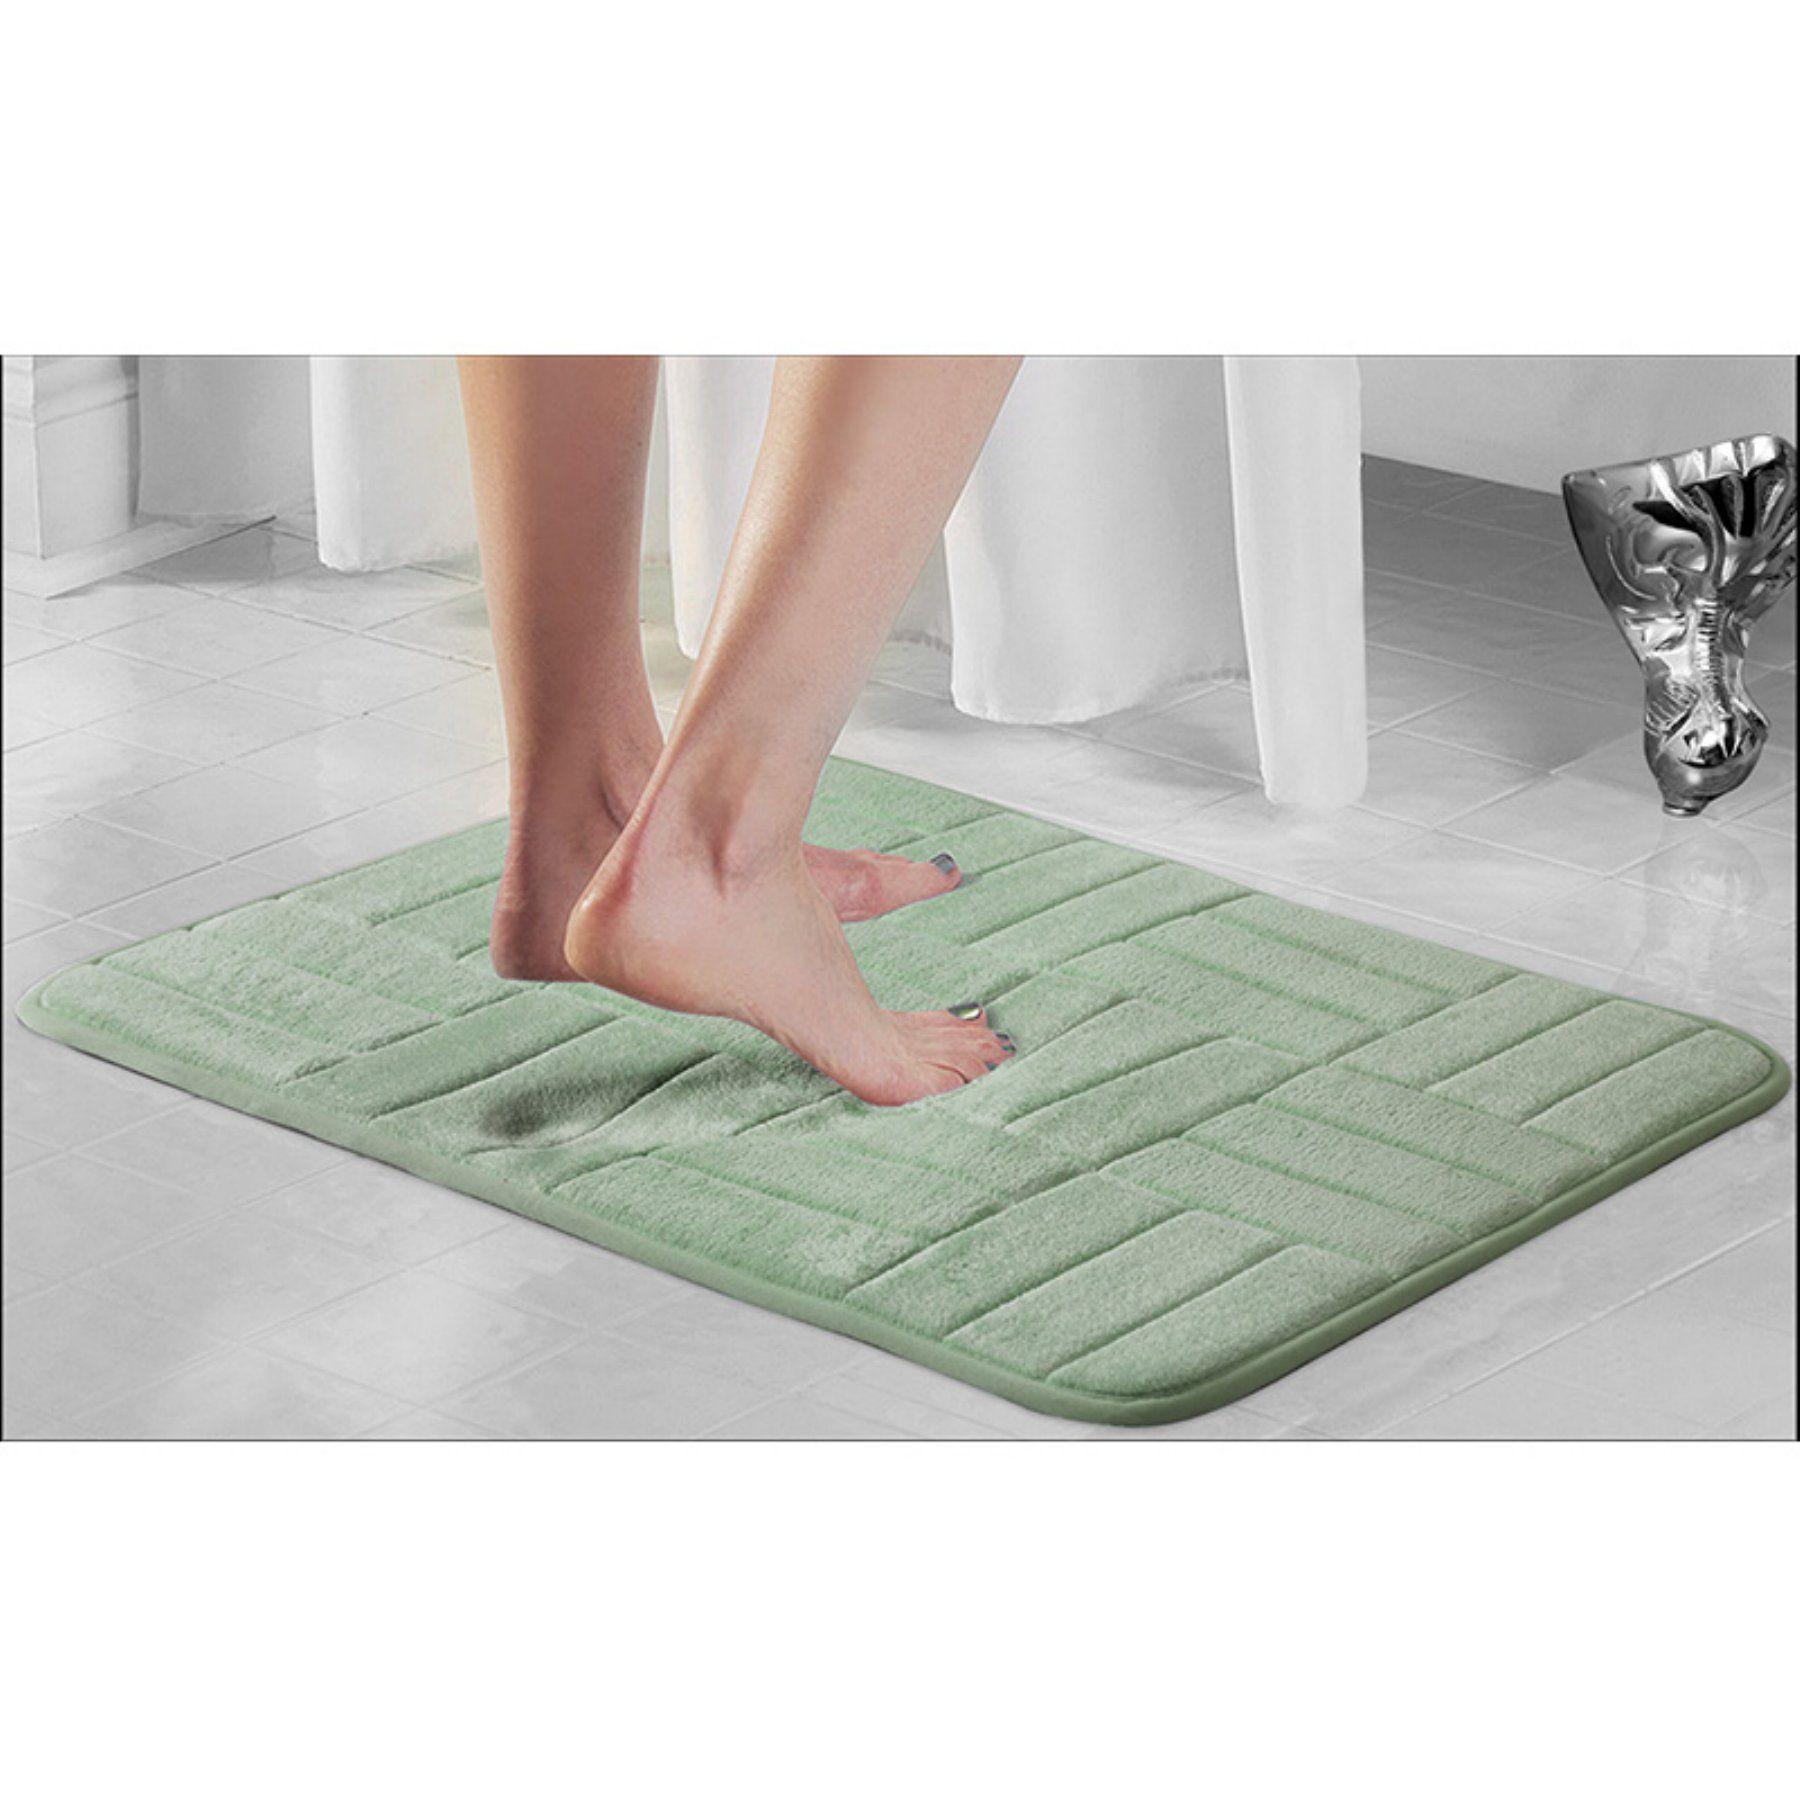 Willow Arlo Interiors Parquet Rug Popular Bath Bath Mat Memory